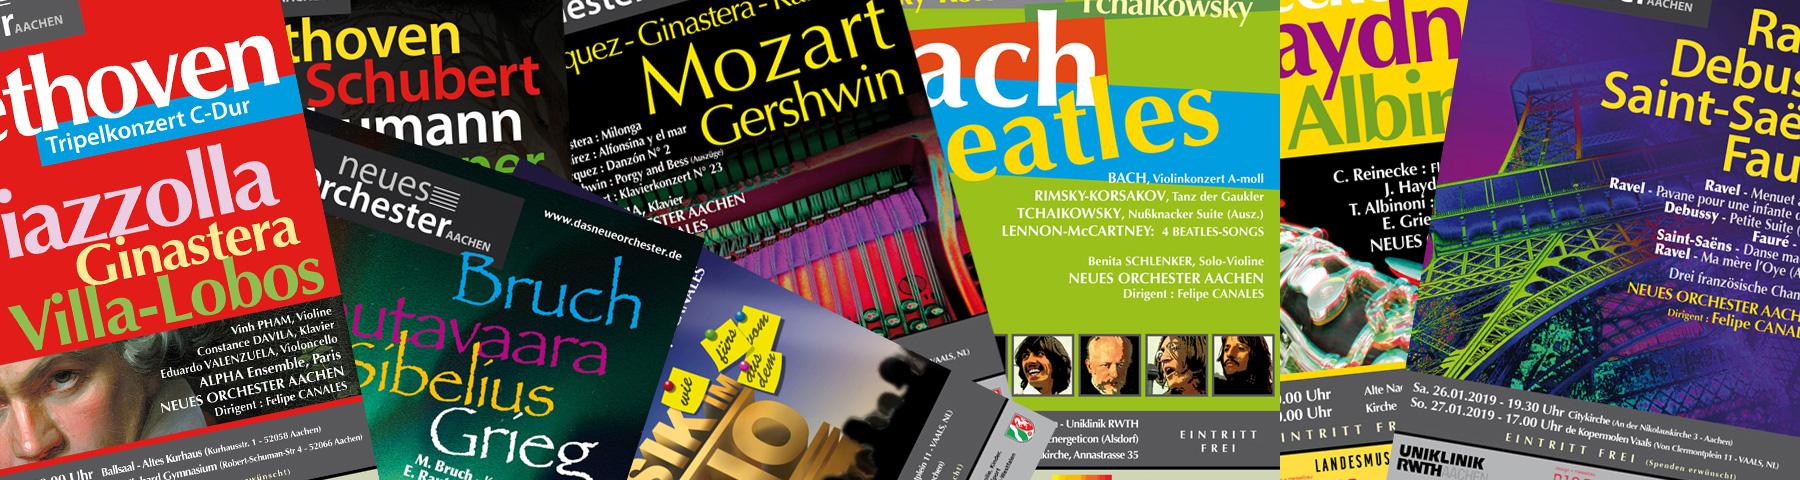 Neues Orchester Aachen